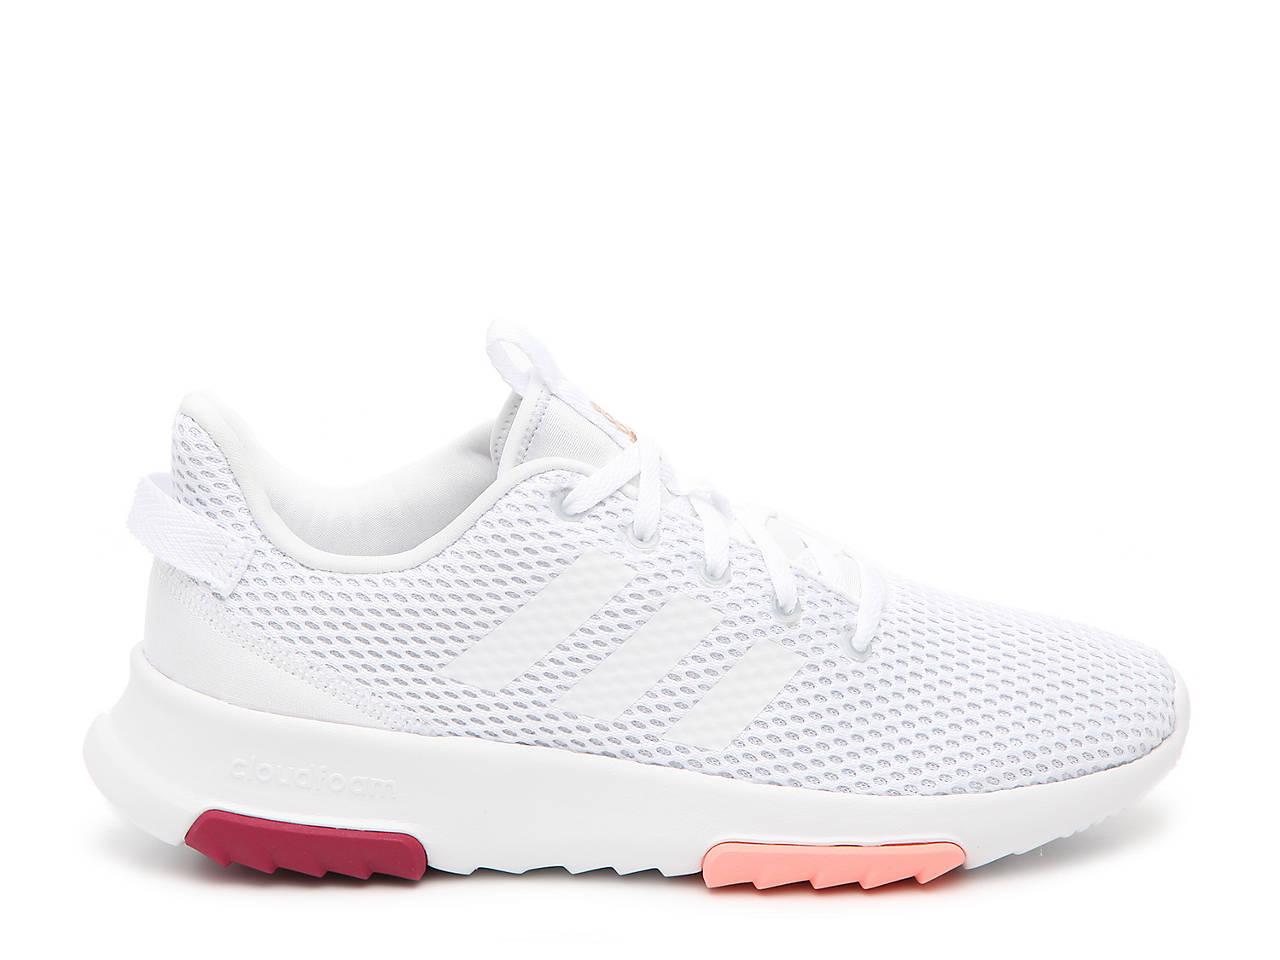 size 40 34624 27b5c Cloudfoam Racer TR Sneaker - Women s. next